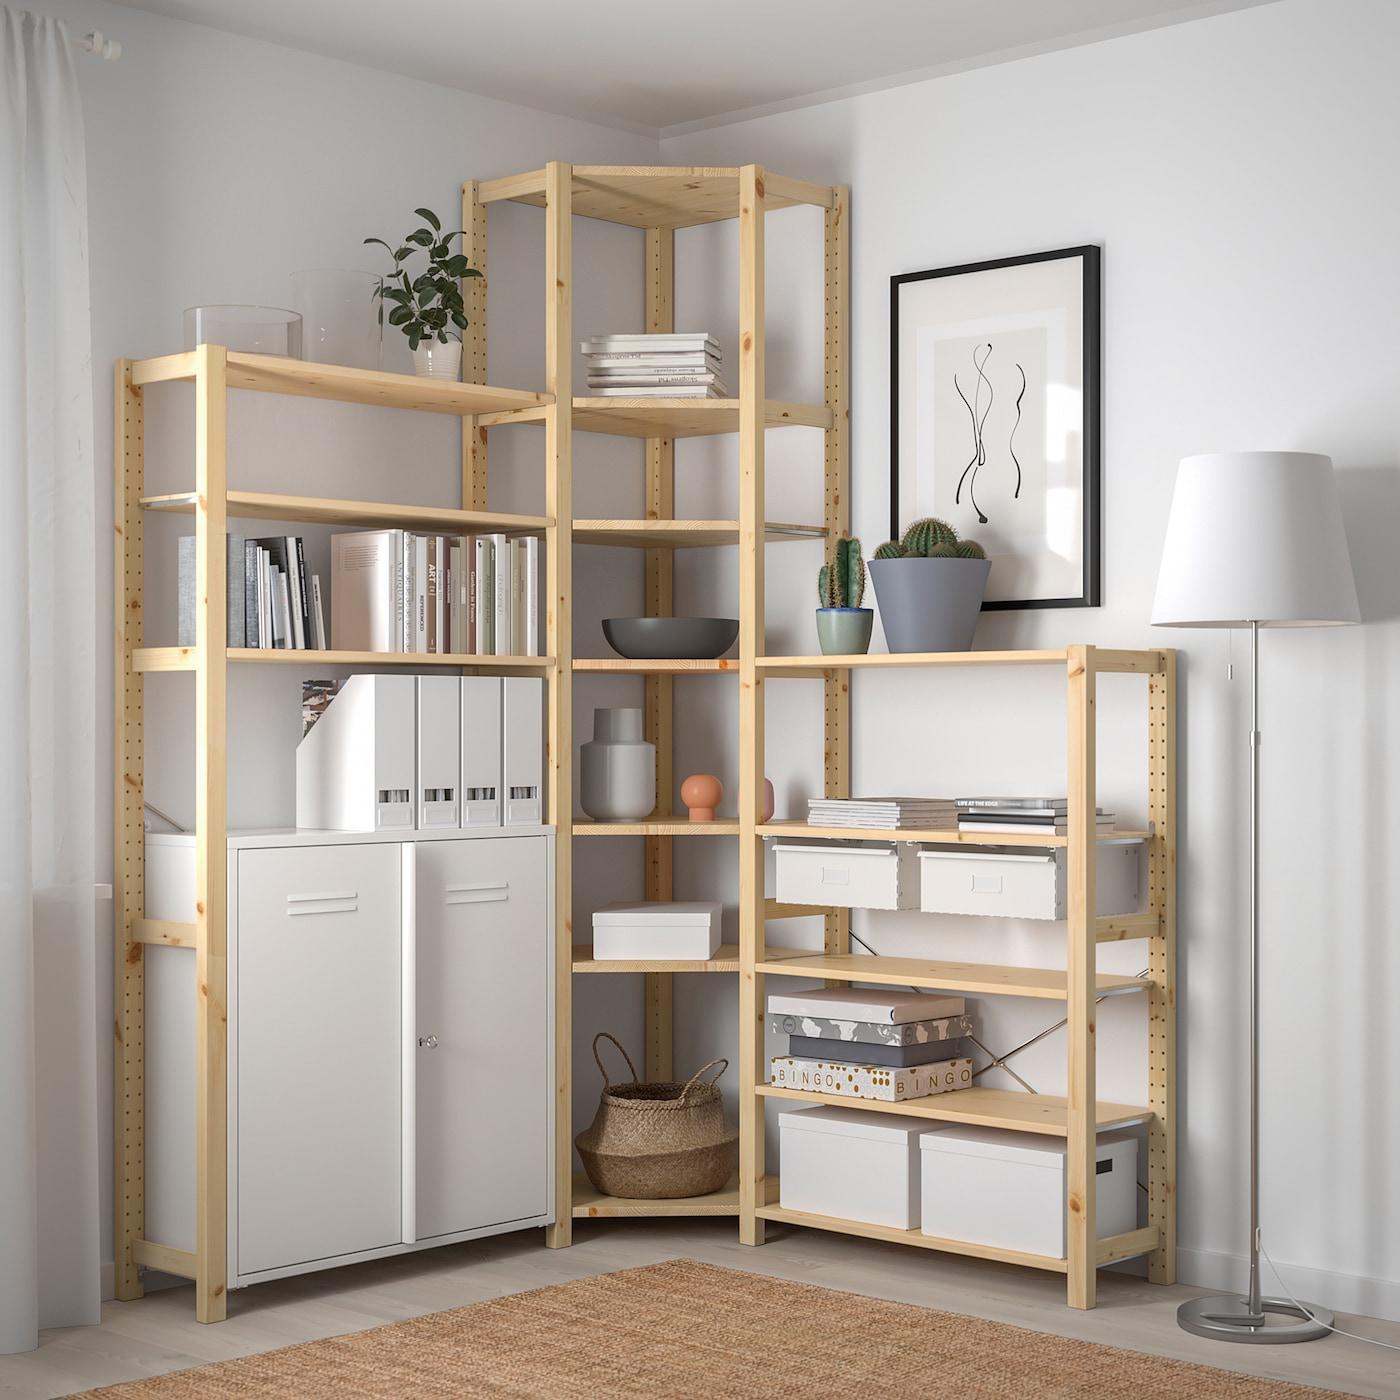 IVAR 3 ElemEcke Kieferweiß IKEA Österreich